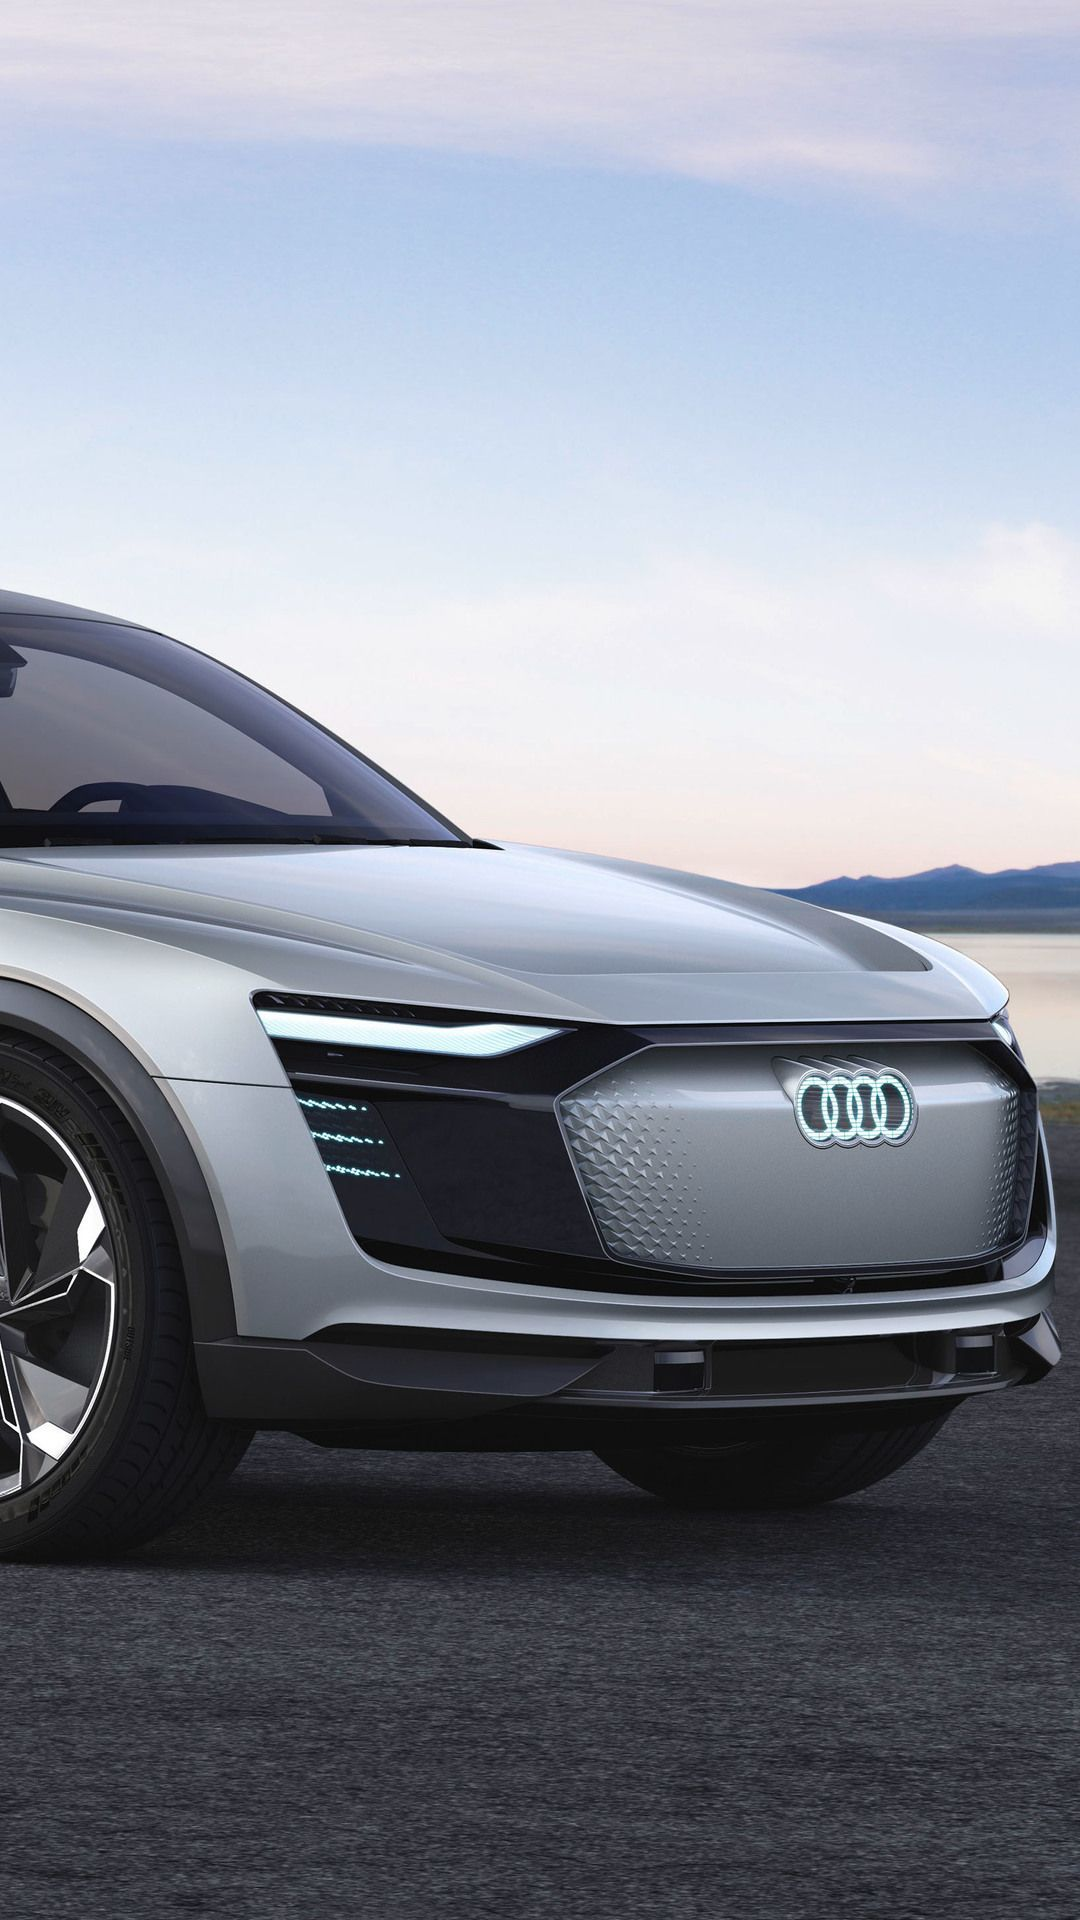 Tag For Audi 2017 4k Wallpaper E Tron Iphone 7 Audi - Concept Audi E Tron Sportback , HD Wallpaper & Backgrounds